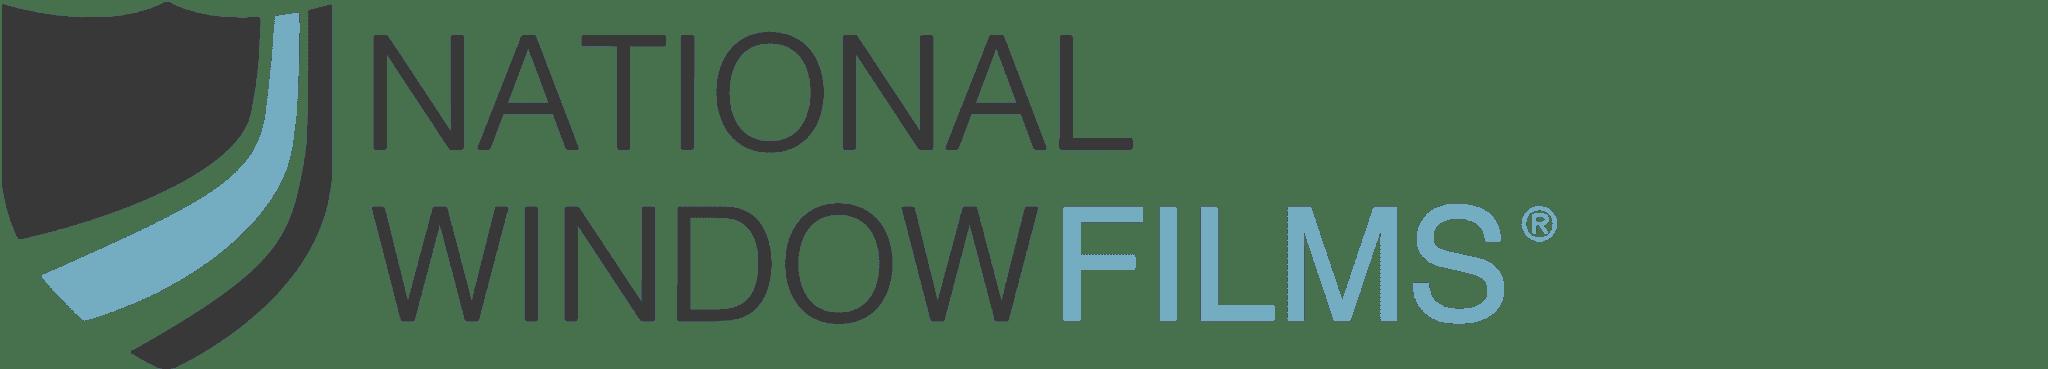 National Window Films